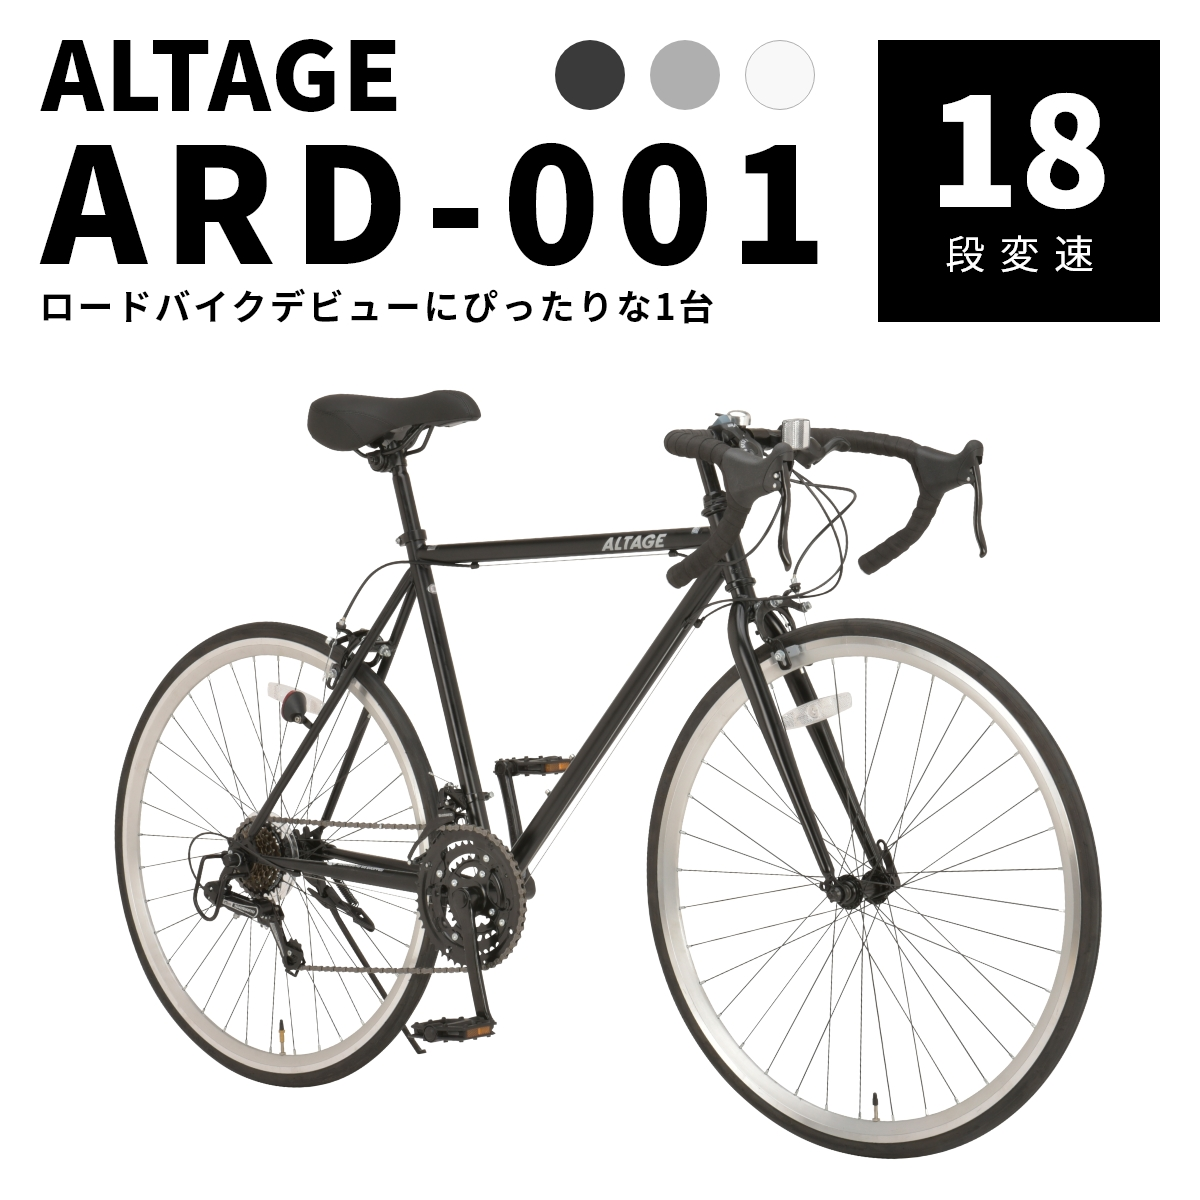 ard-001_ec_01